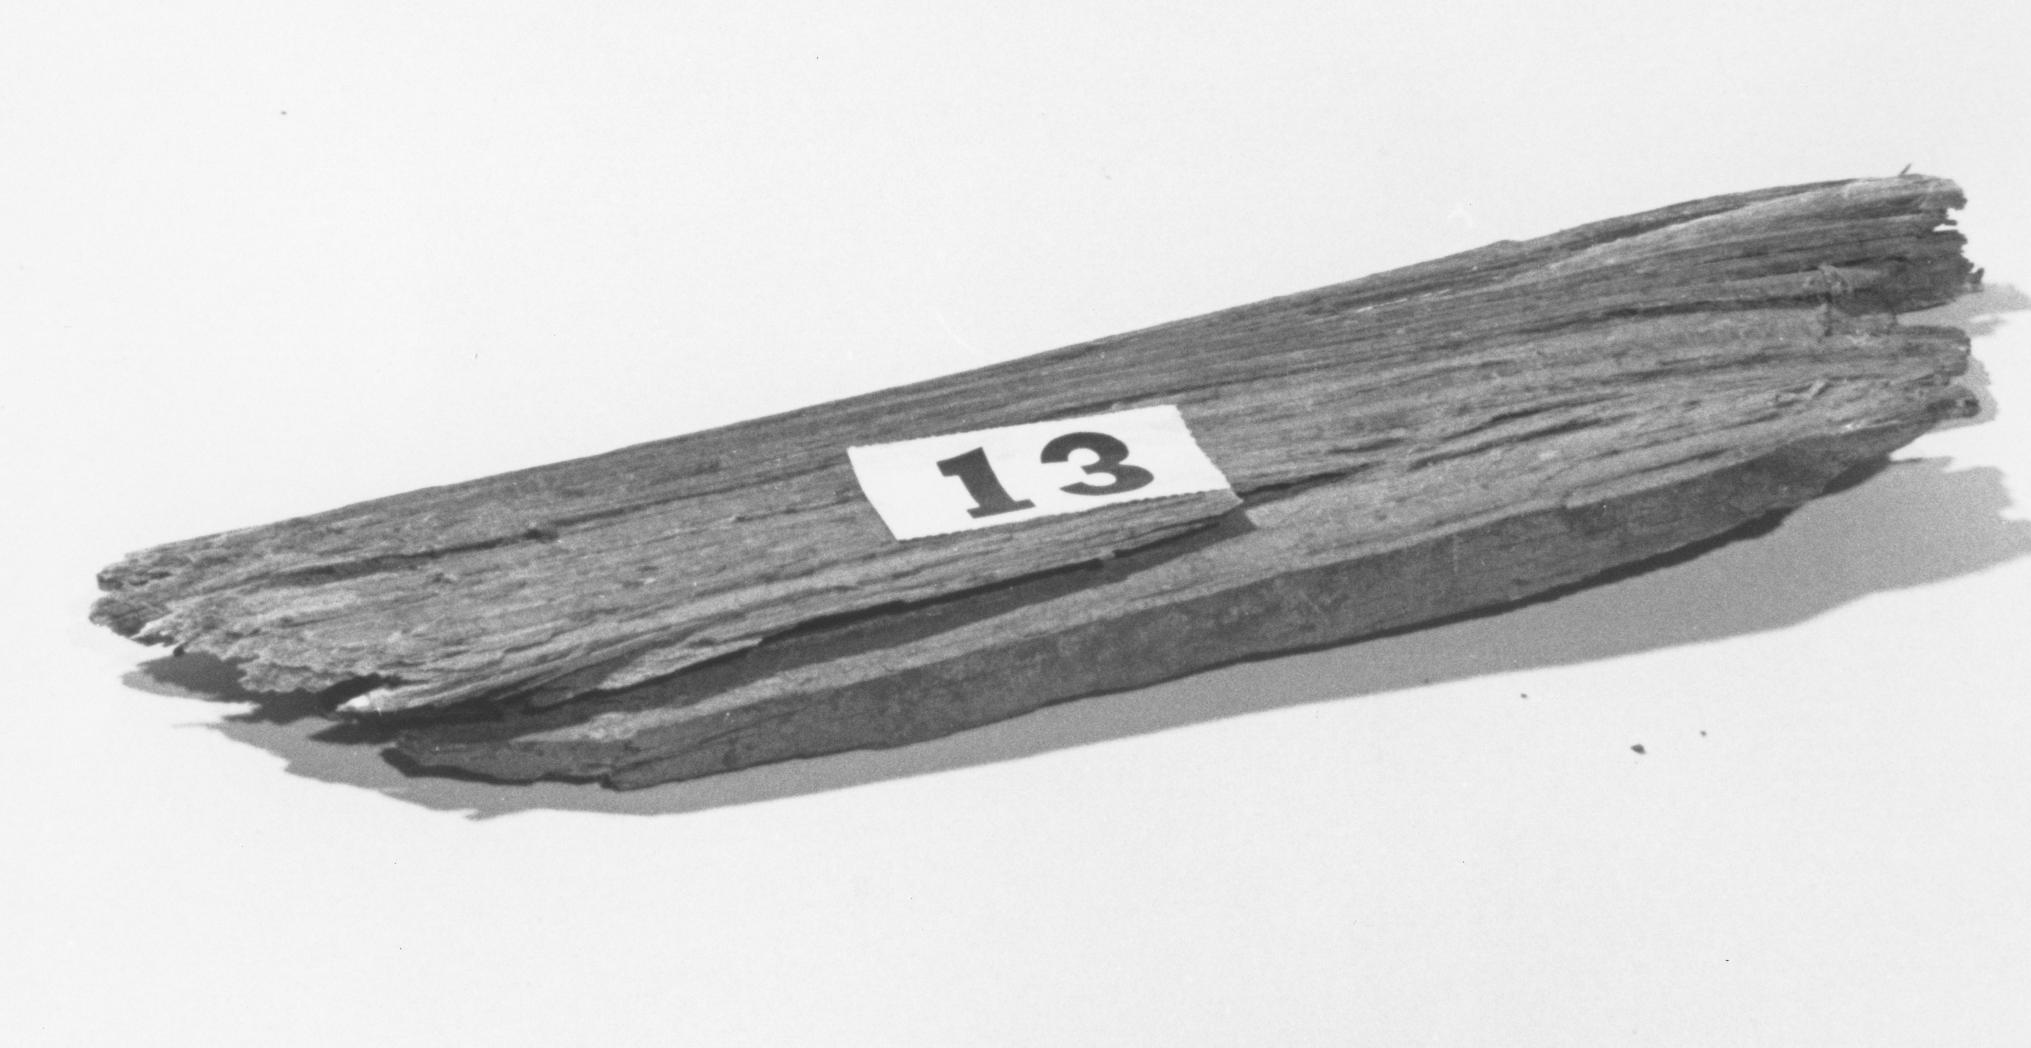 Unknown artifact